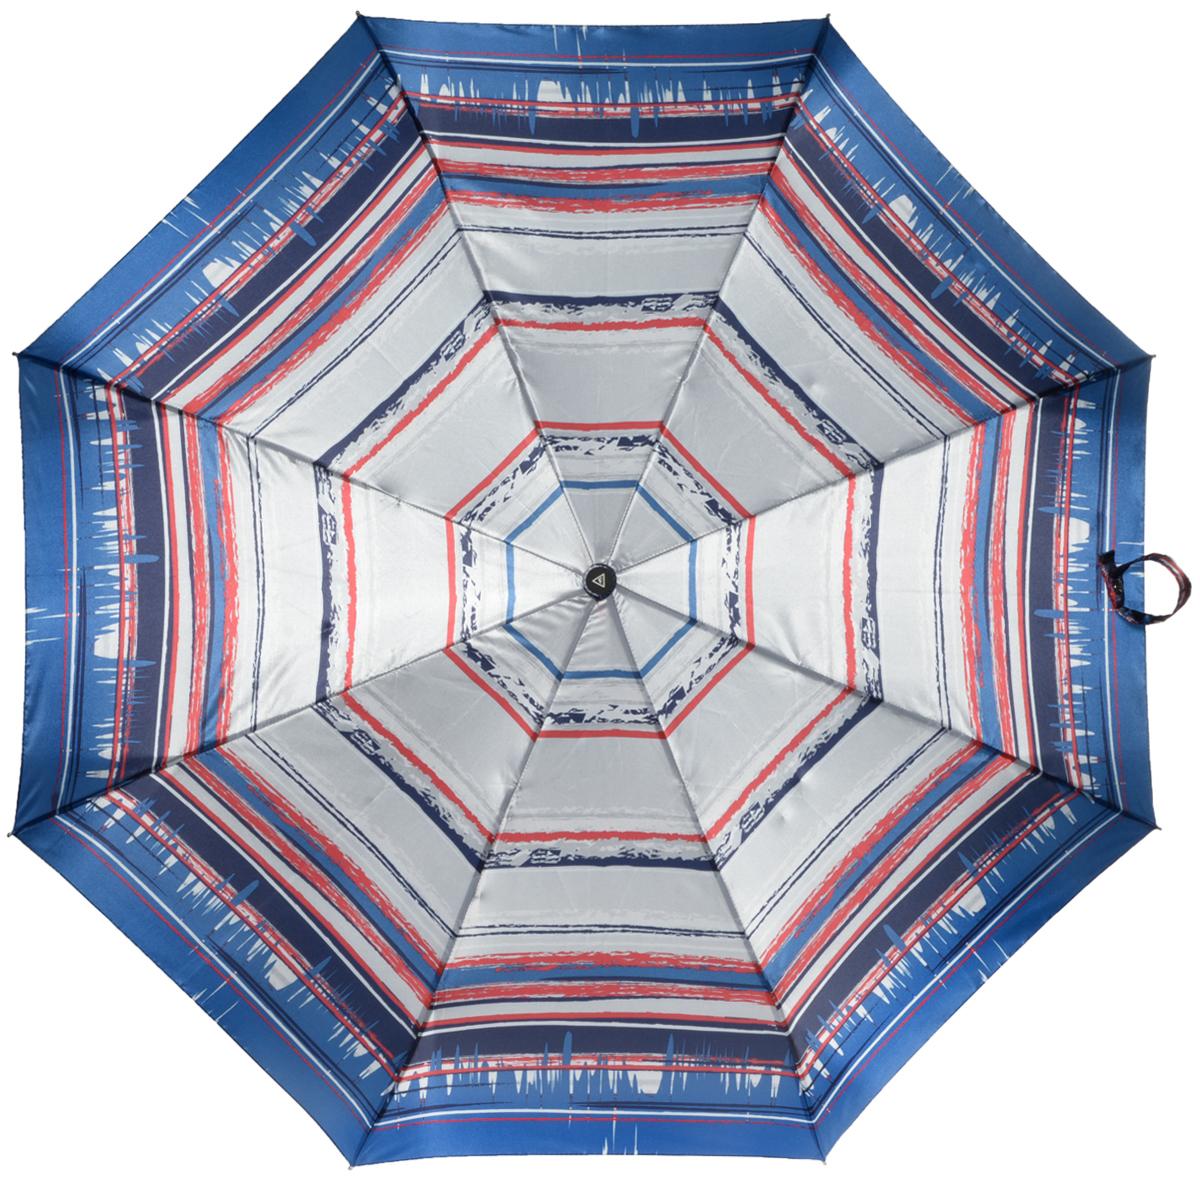 Зонт женский Fabretti, автомат, 3 сложения, цвет: мультиколор. L-16105-7L-16105-7Зонт женский Fabretti, облегченный суперавтомат, 3 сложения